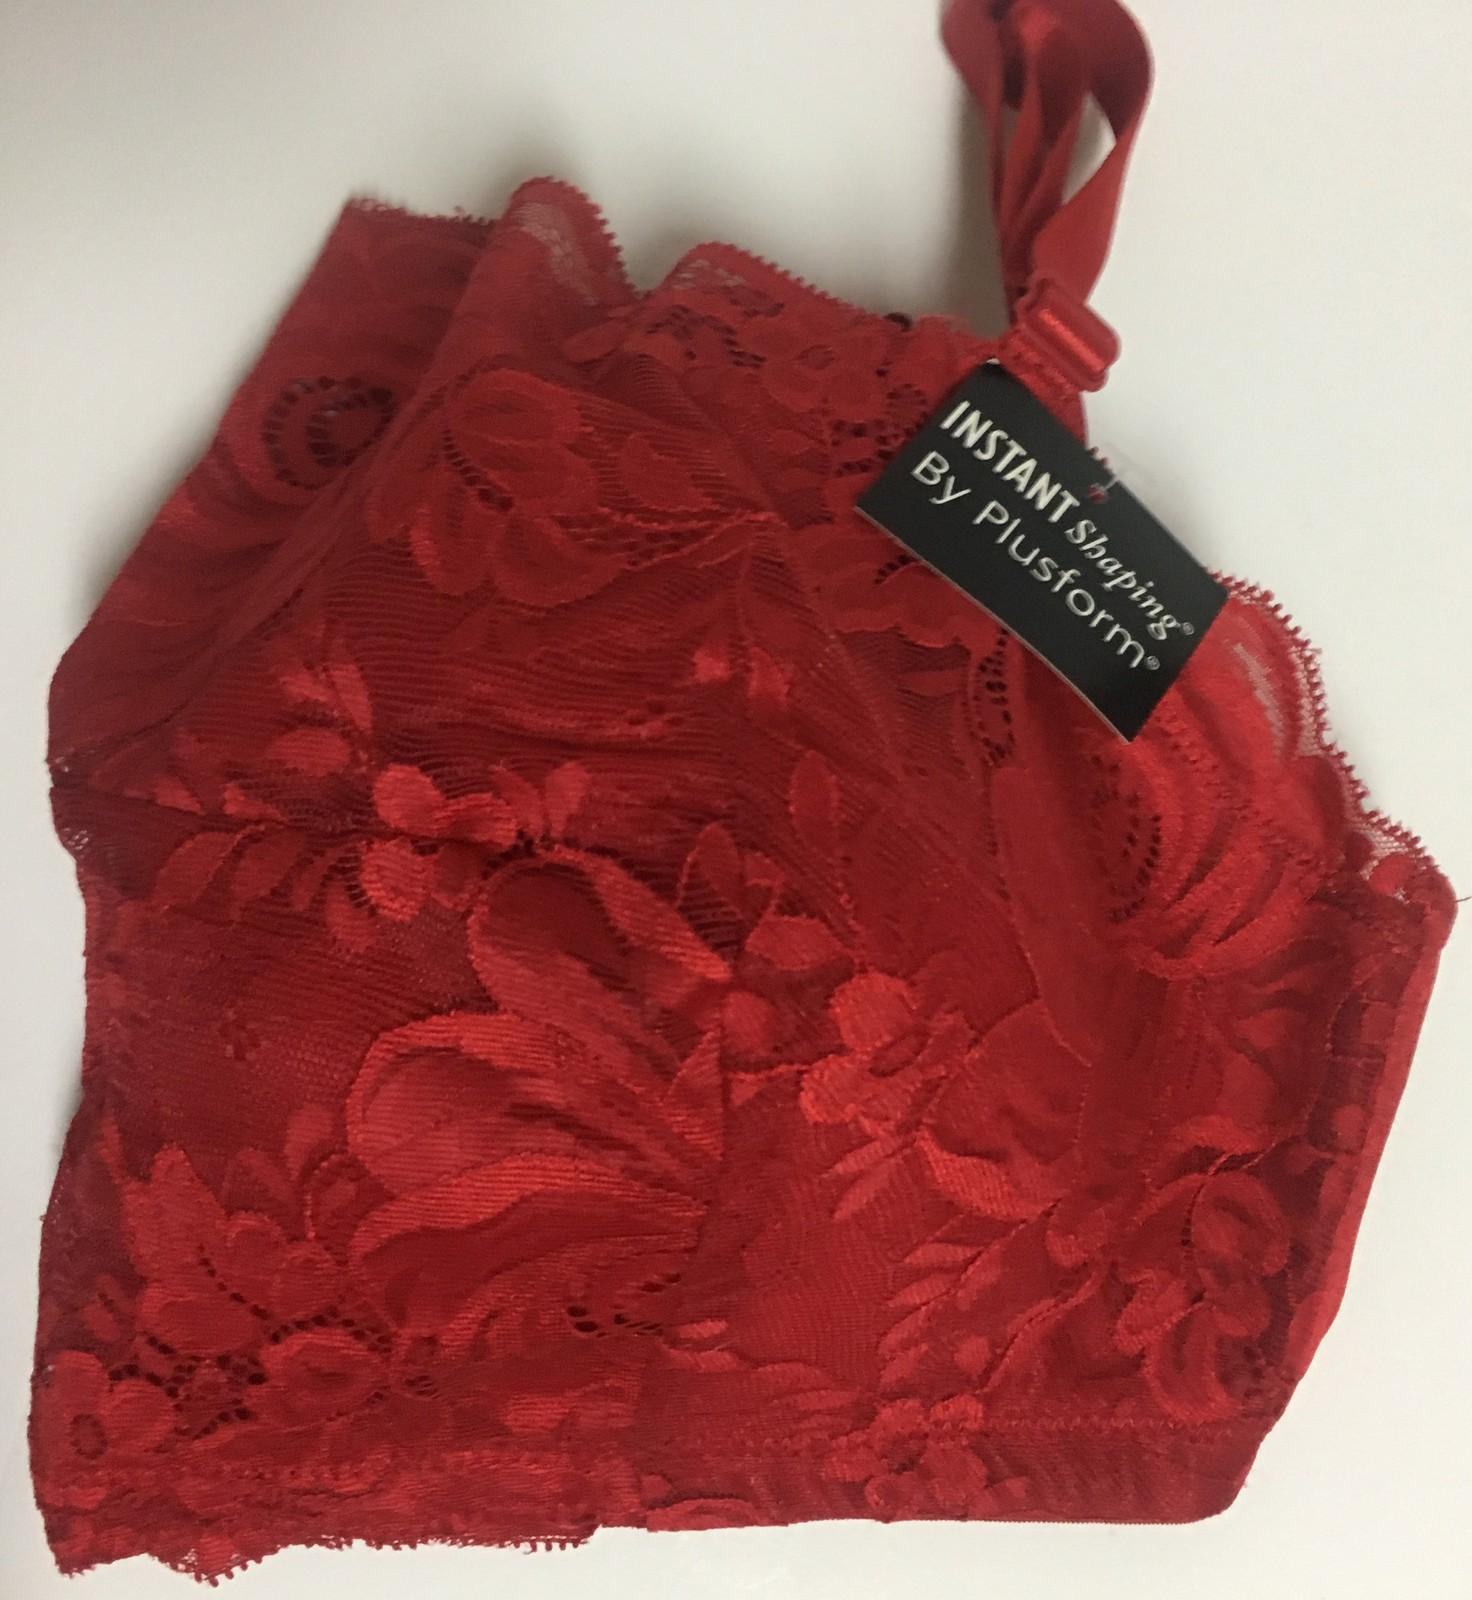 Plushform Red Lace Shaping Bra NWT Sz 38D